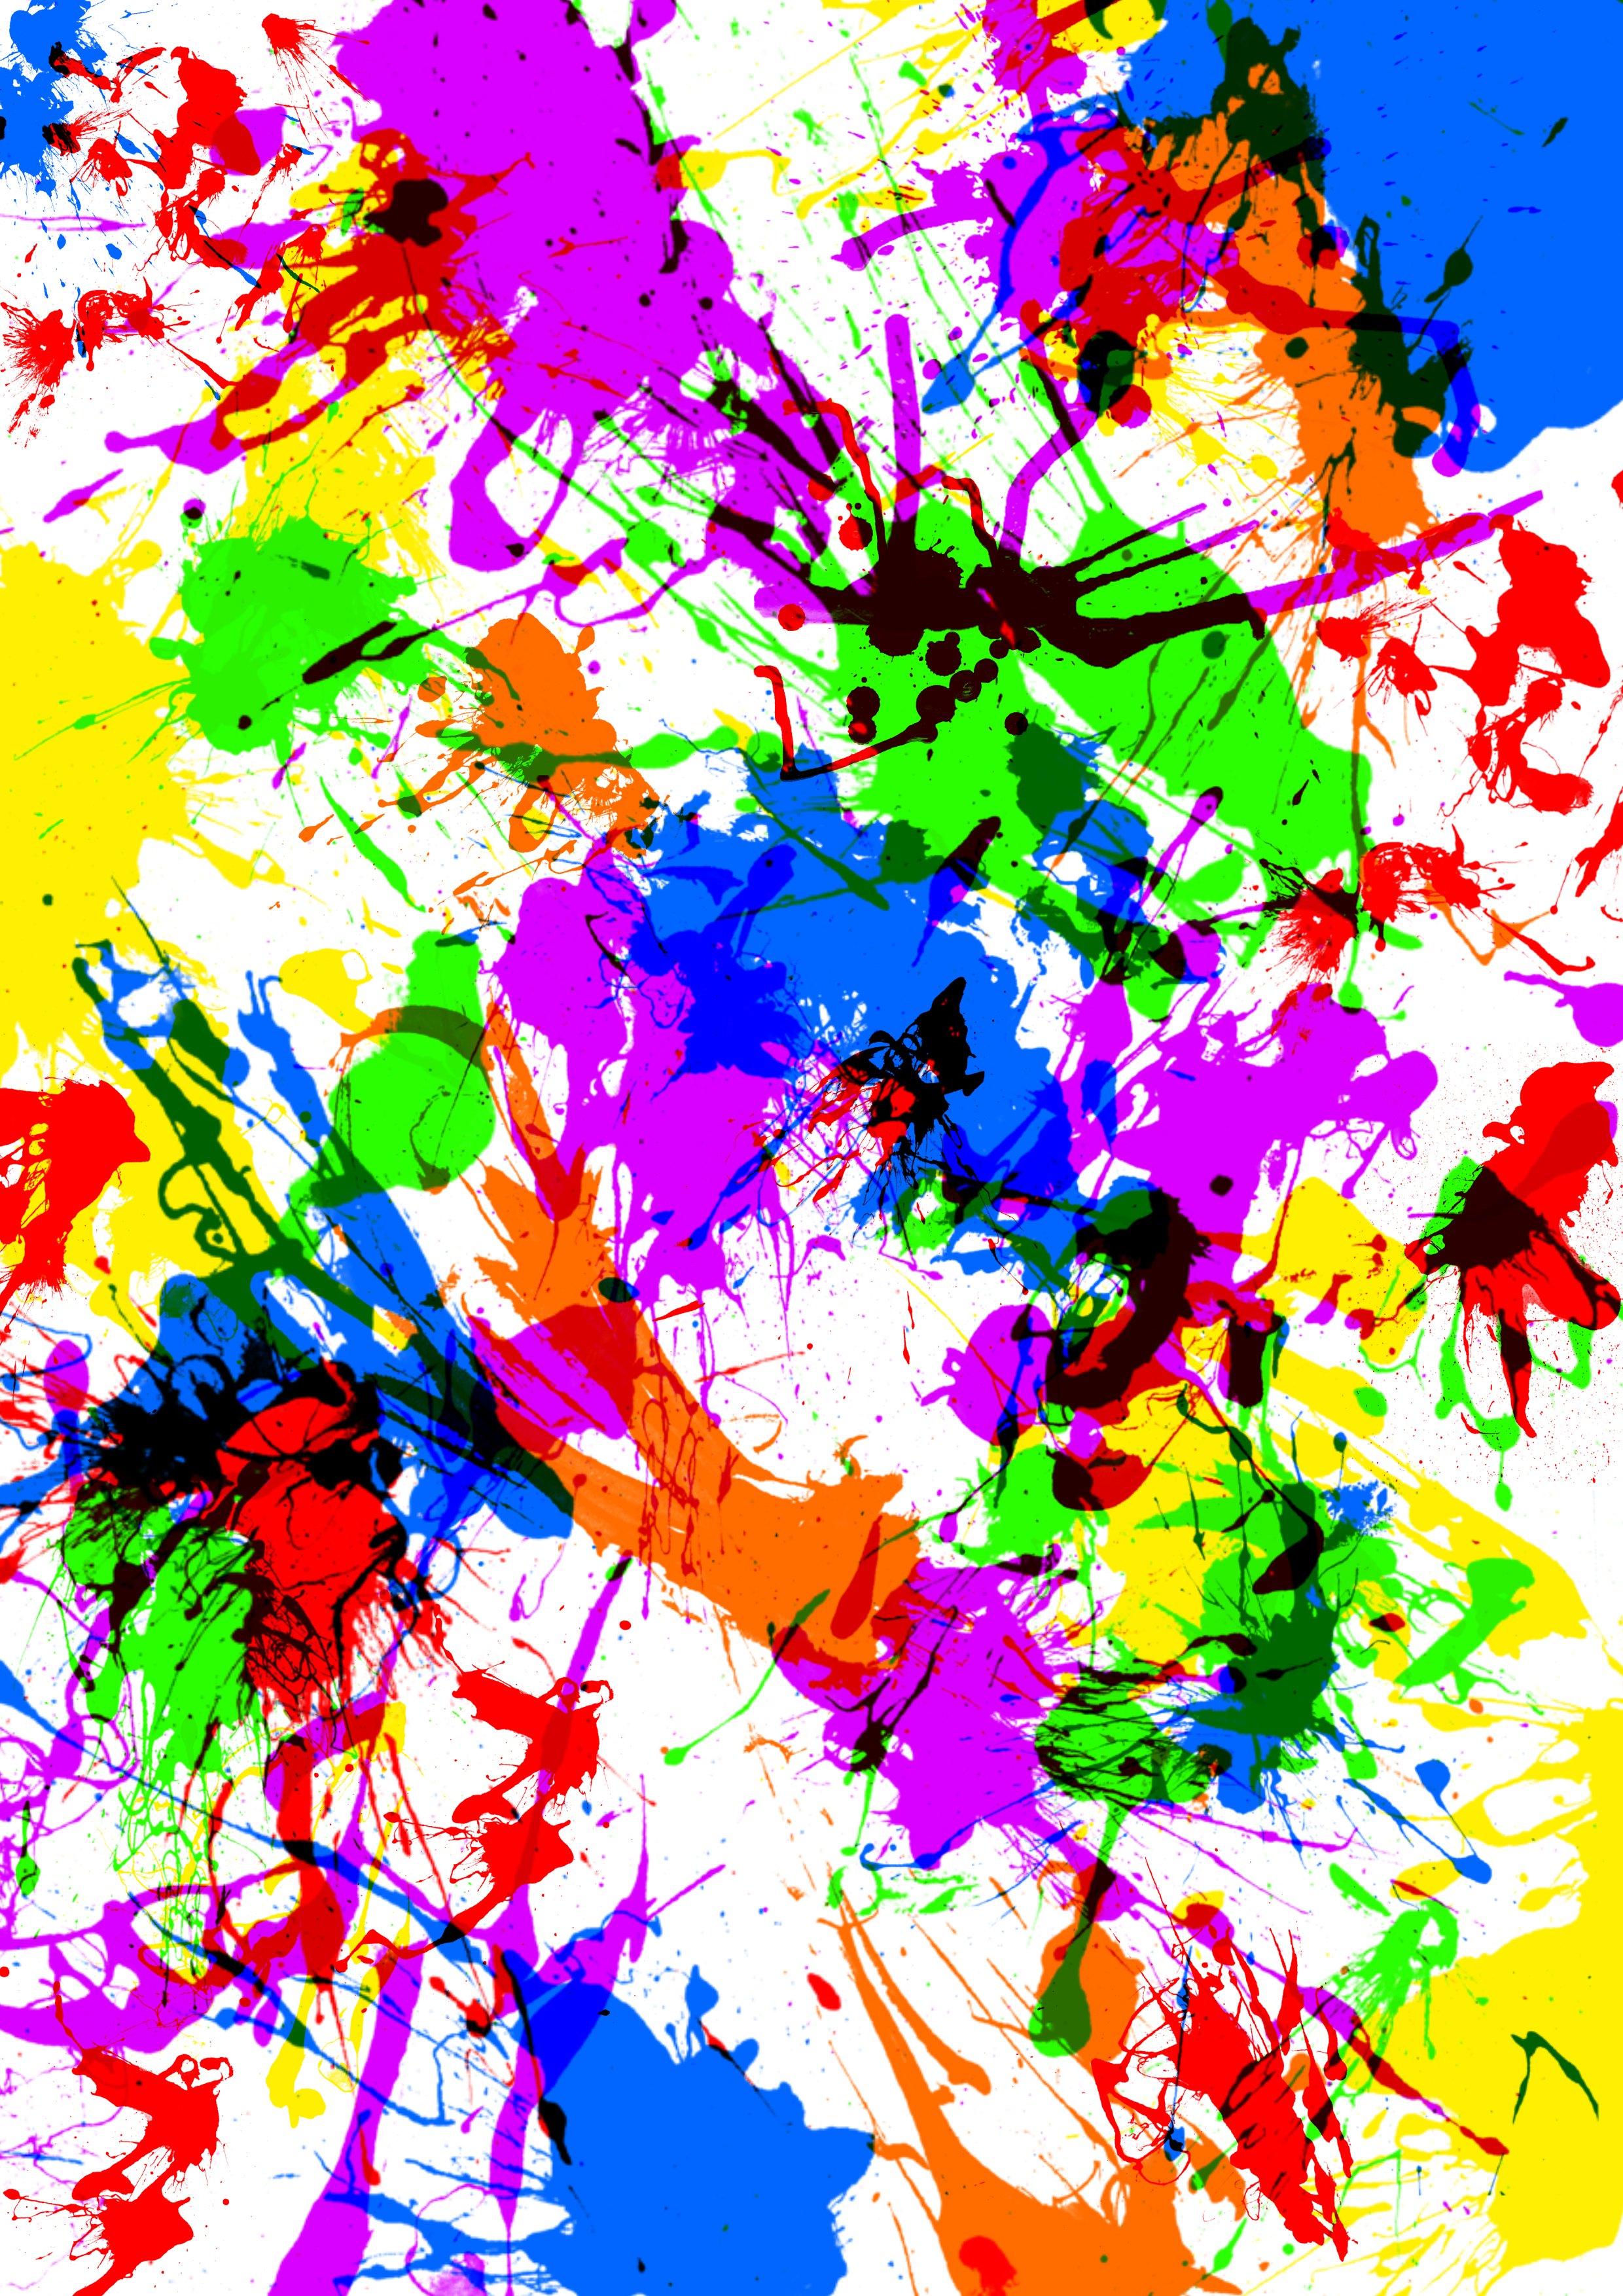 [48+] Neon Splatter Paint Wallpaper on WallpaperSafari